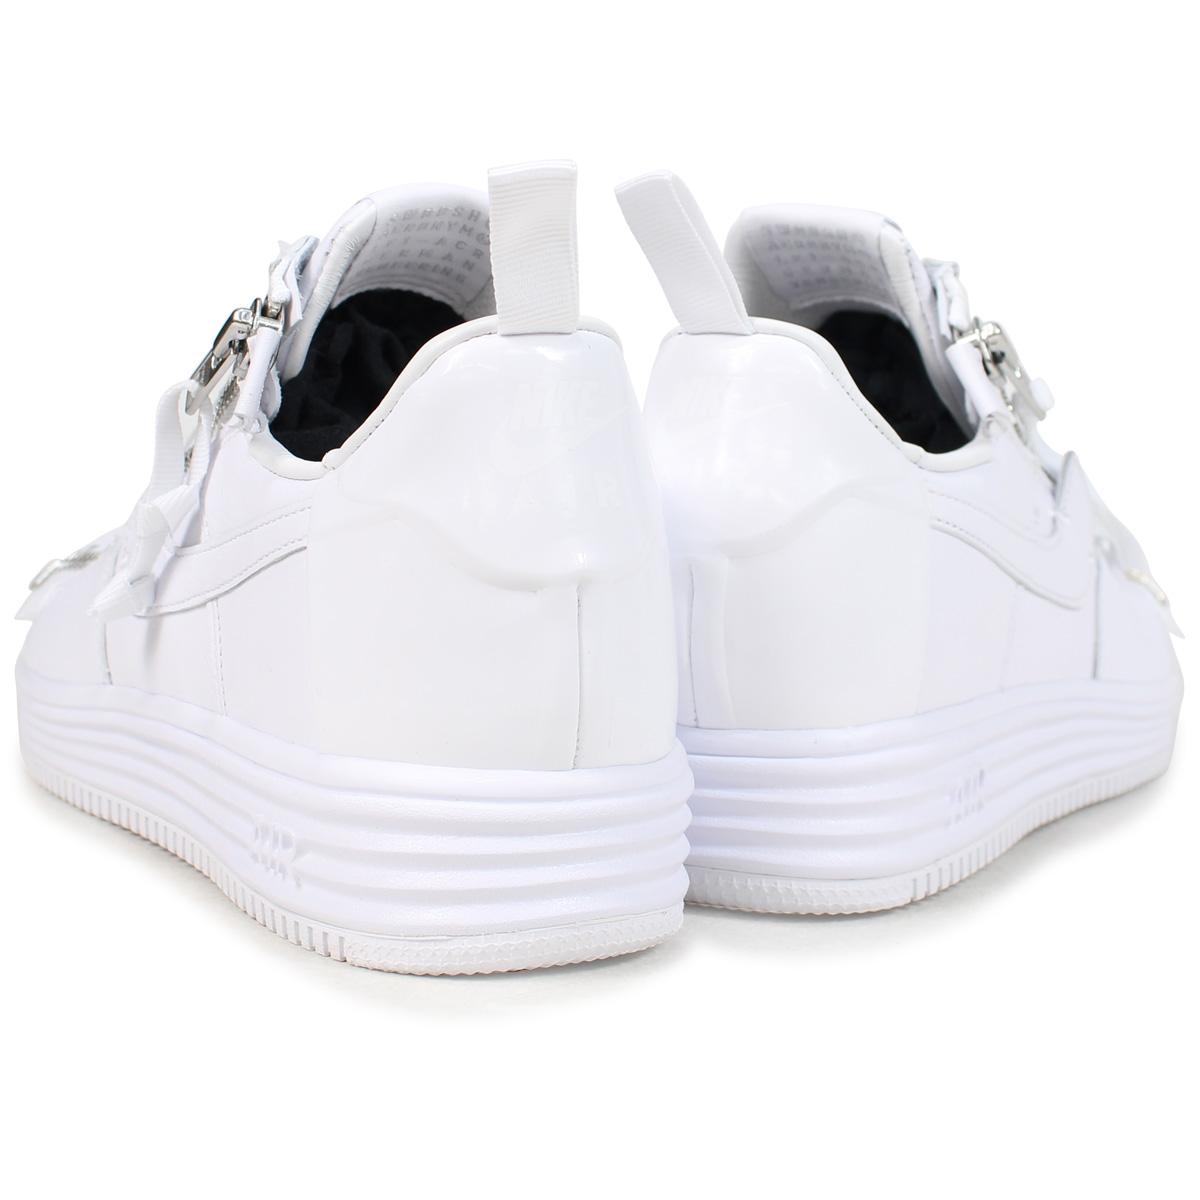 outlet store 911dc 6dbfb ... shop nike lunar force 1 acronym 17 nike luna force 1 sneakers men aj6247  100 white